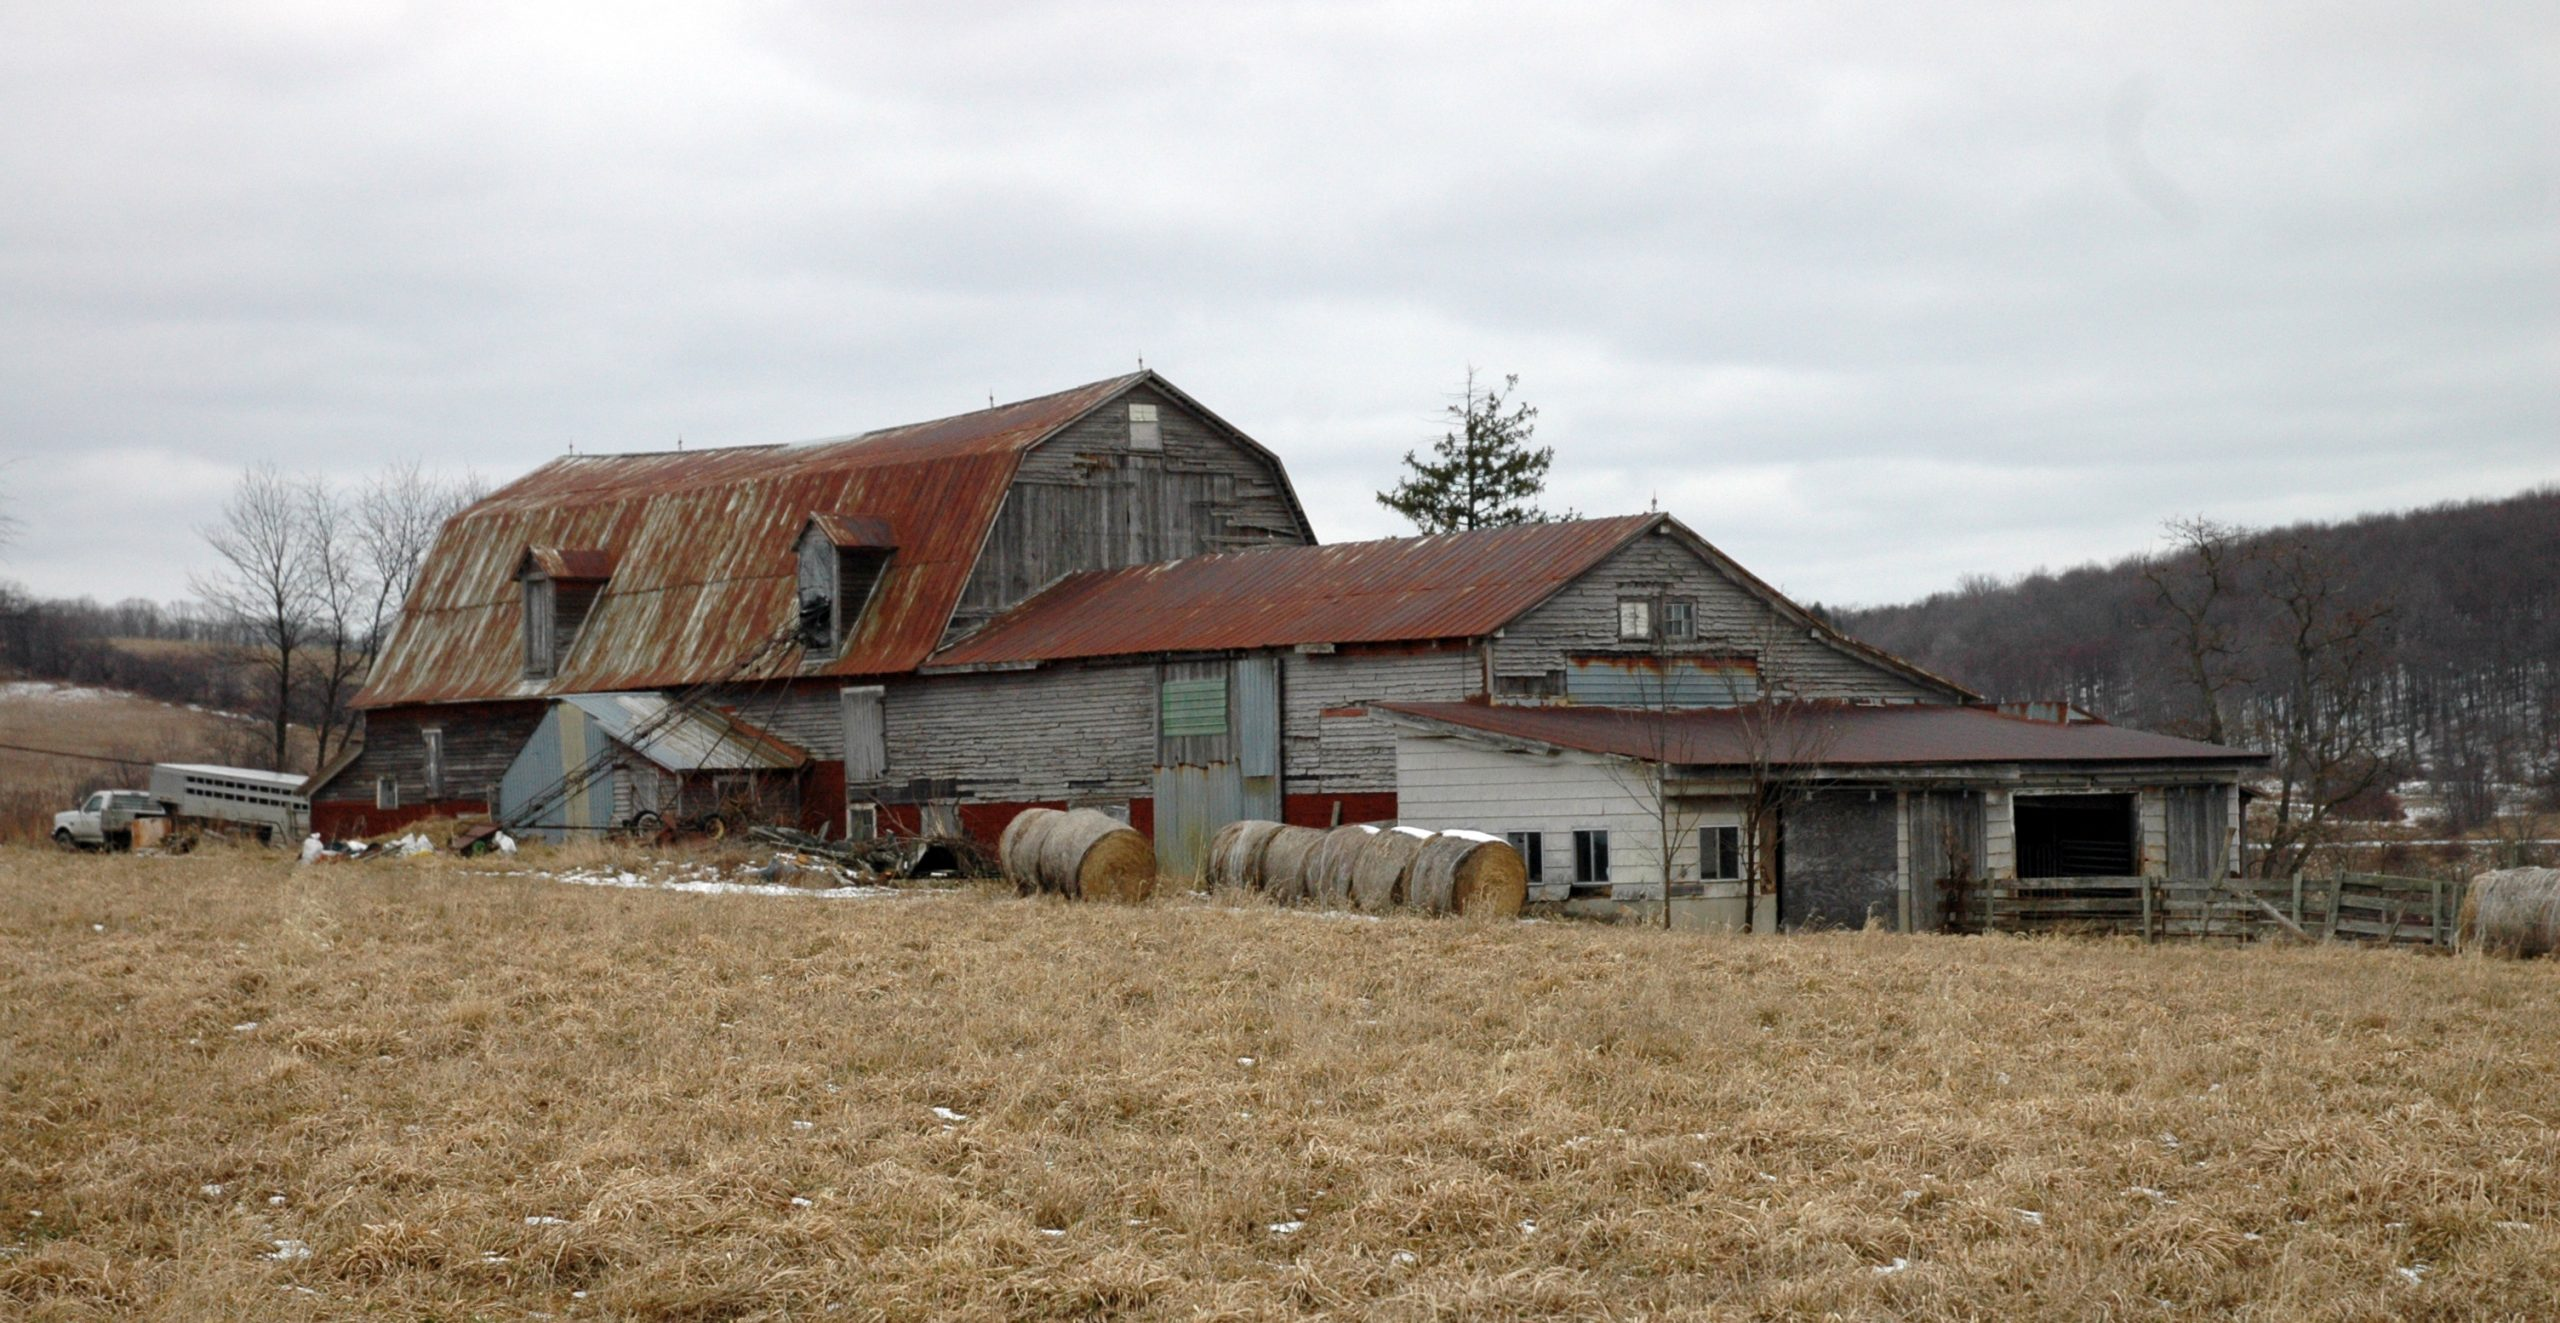 Barn in Montrose Susquehanna County, Pa.